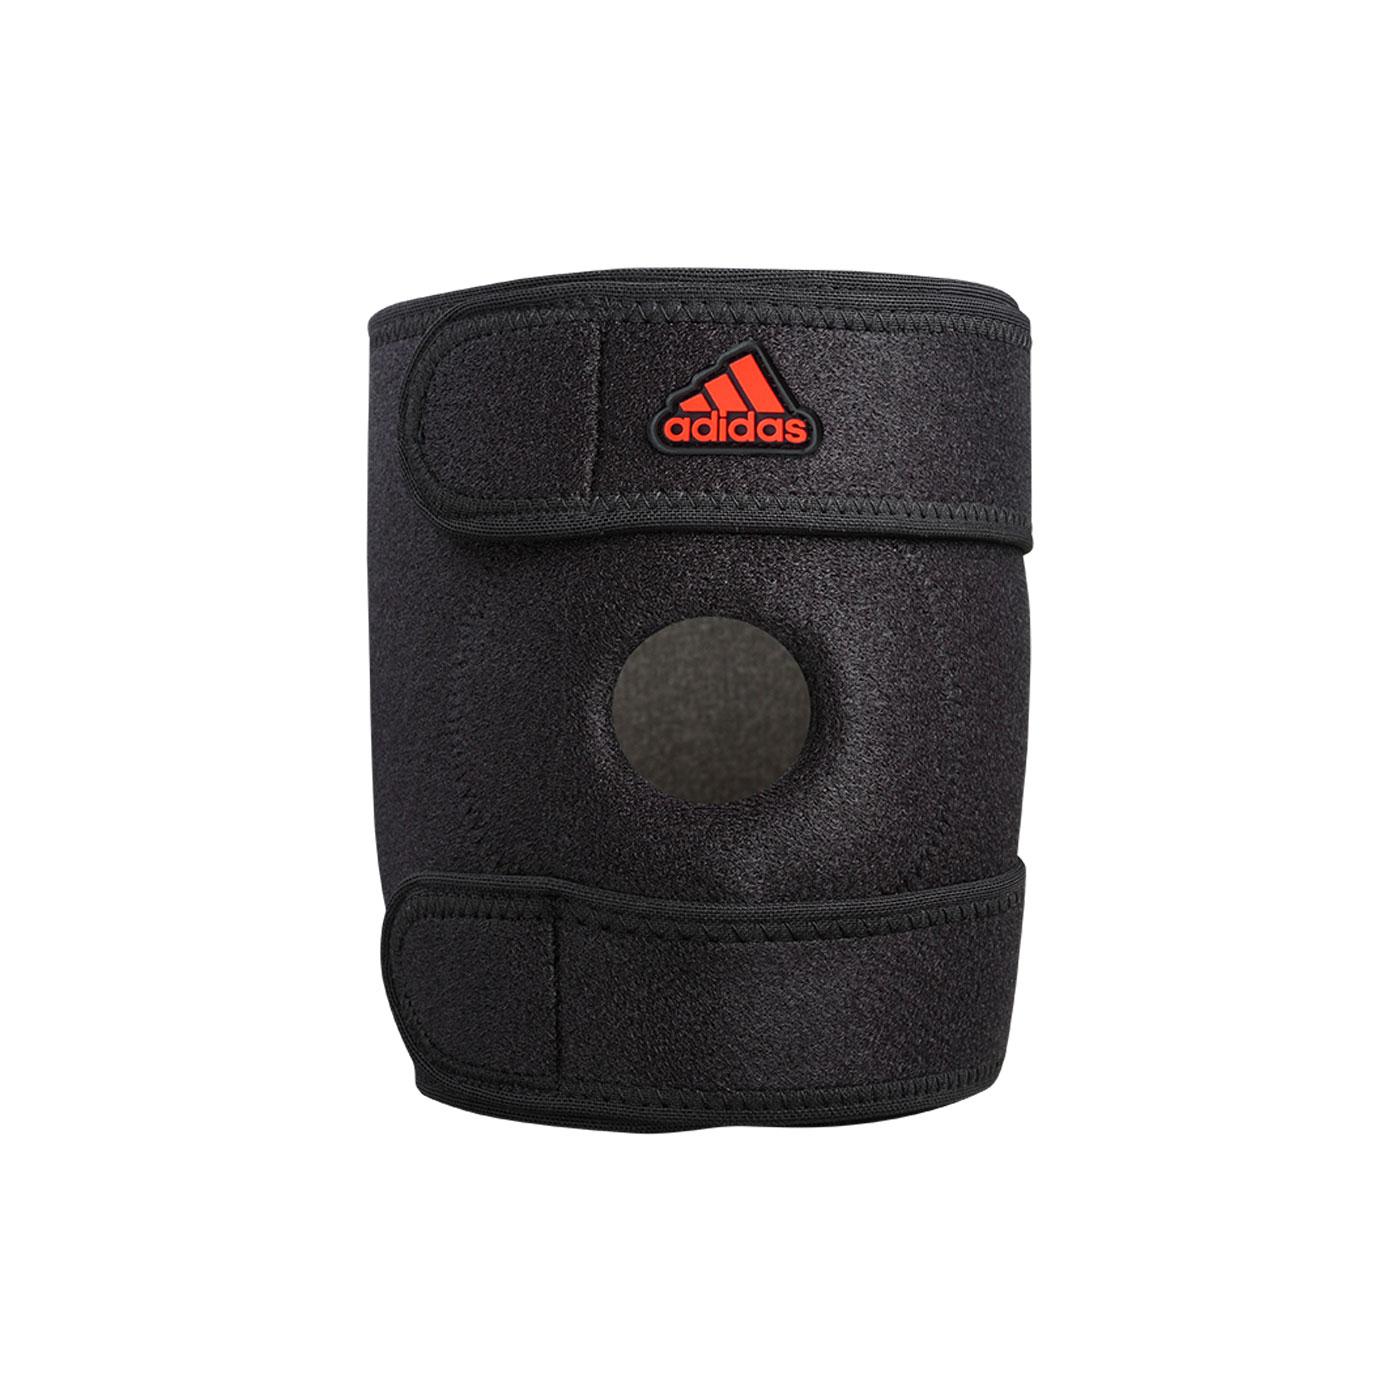 ADIDAS護具 特定-運動護膝 MB0219